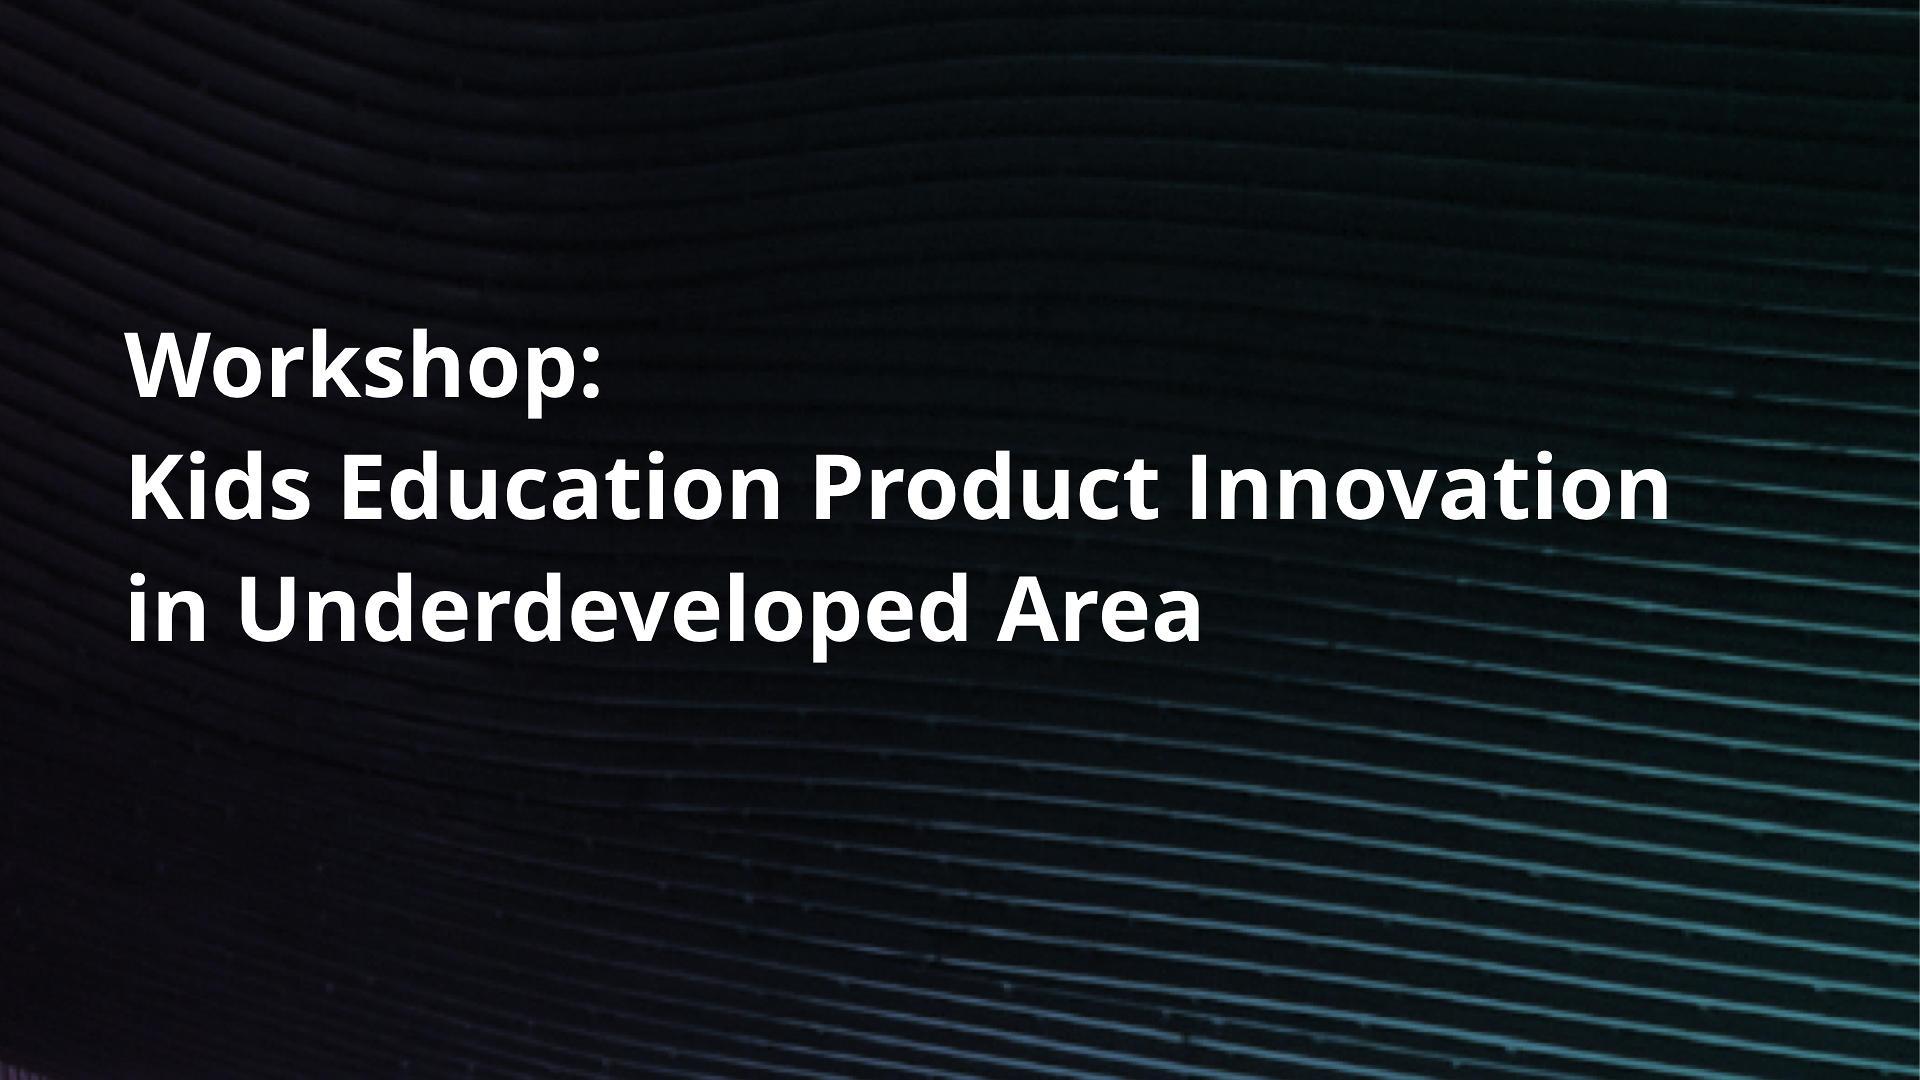 Social Innovation Workshop: Kids Education Product Innovation in Underdeveloped Area